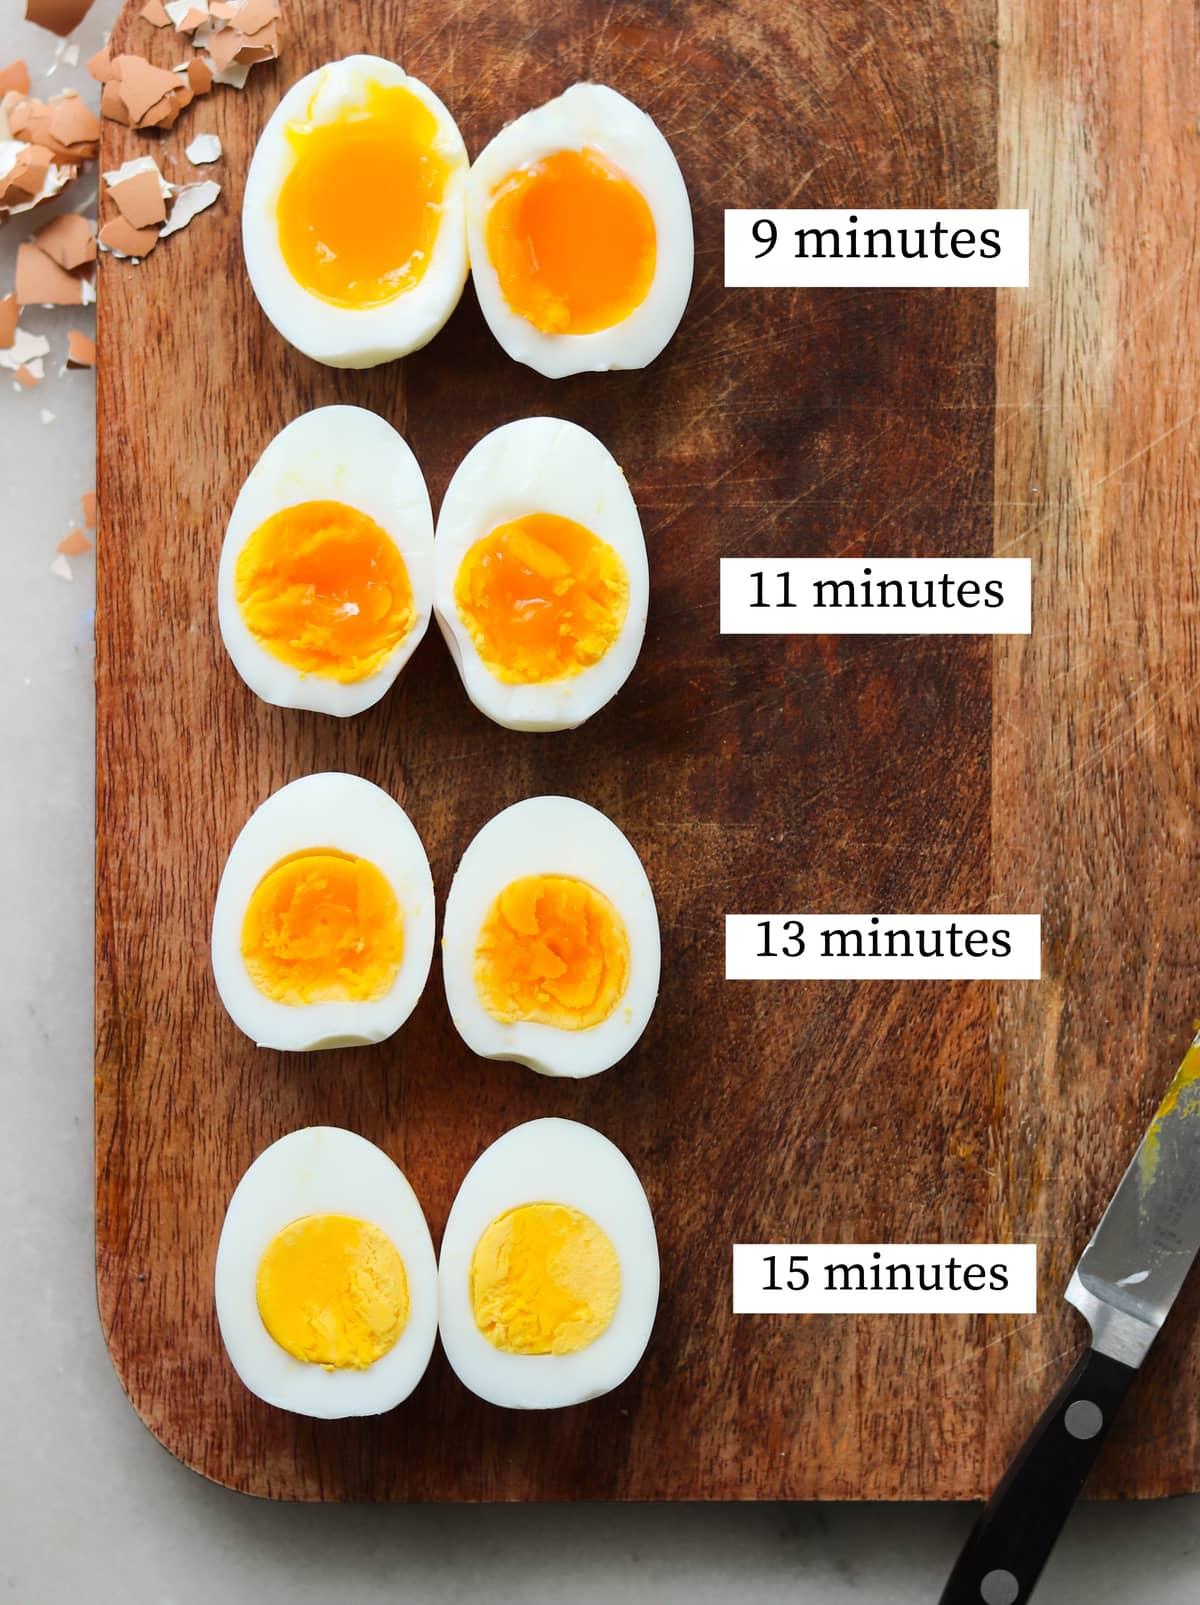 Air Fryer Eggs - Hard or Soft Boiled